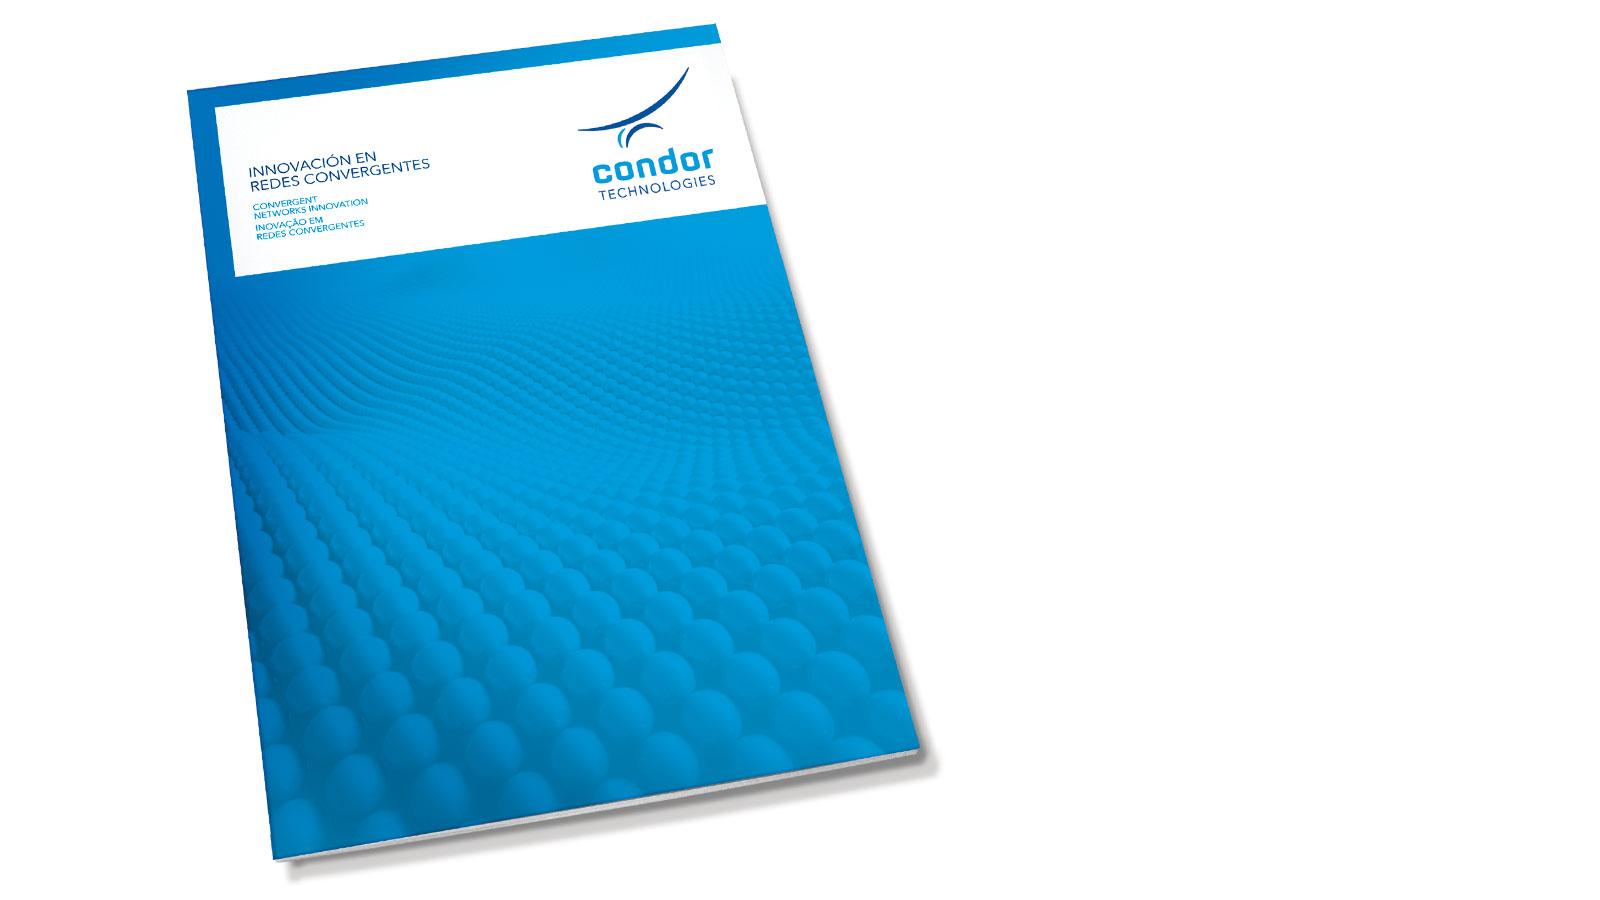 Condor Technologies